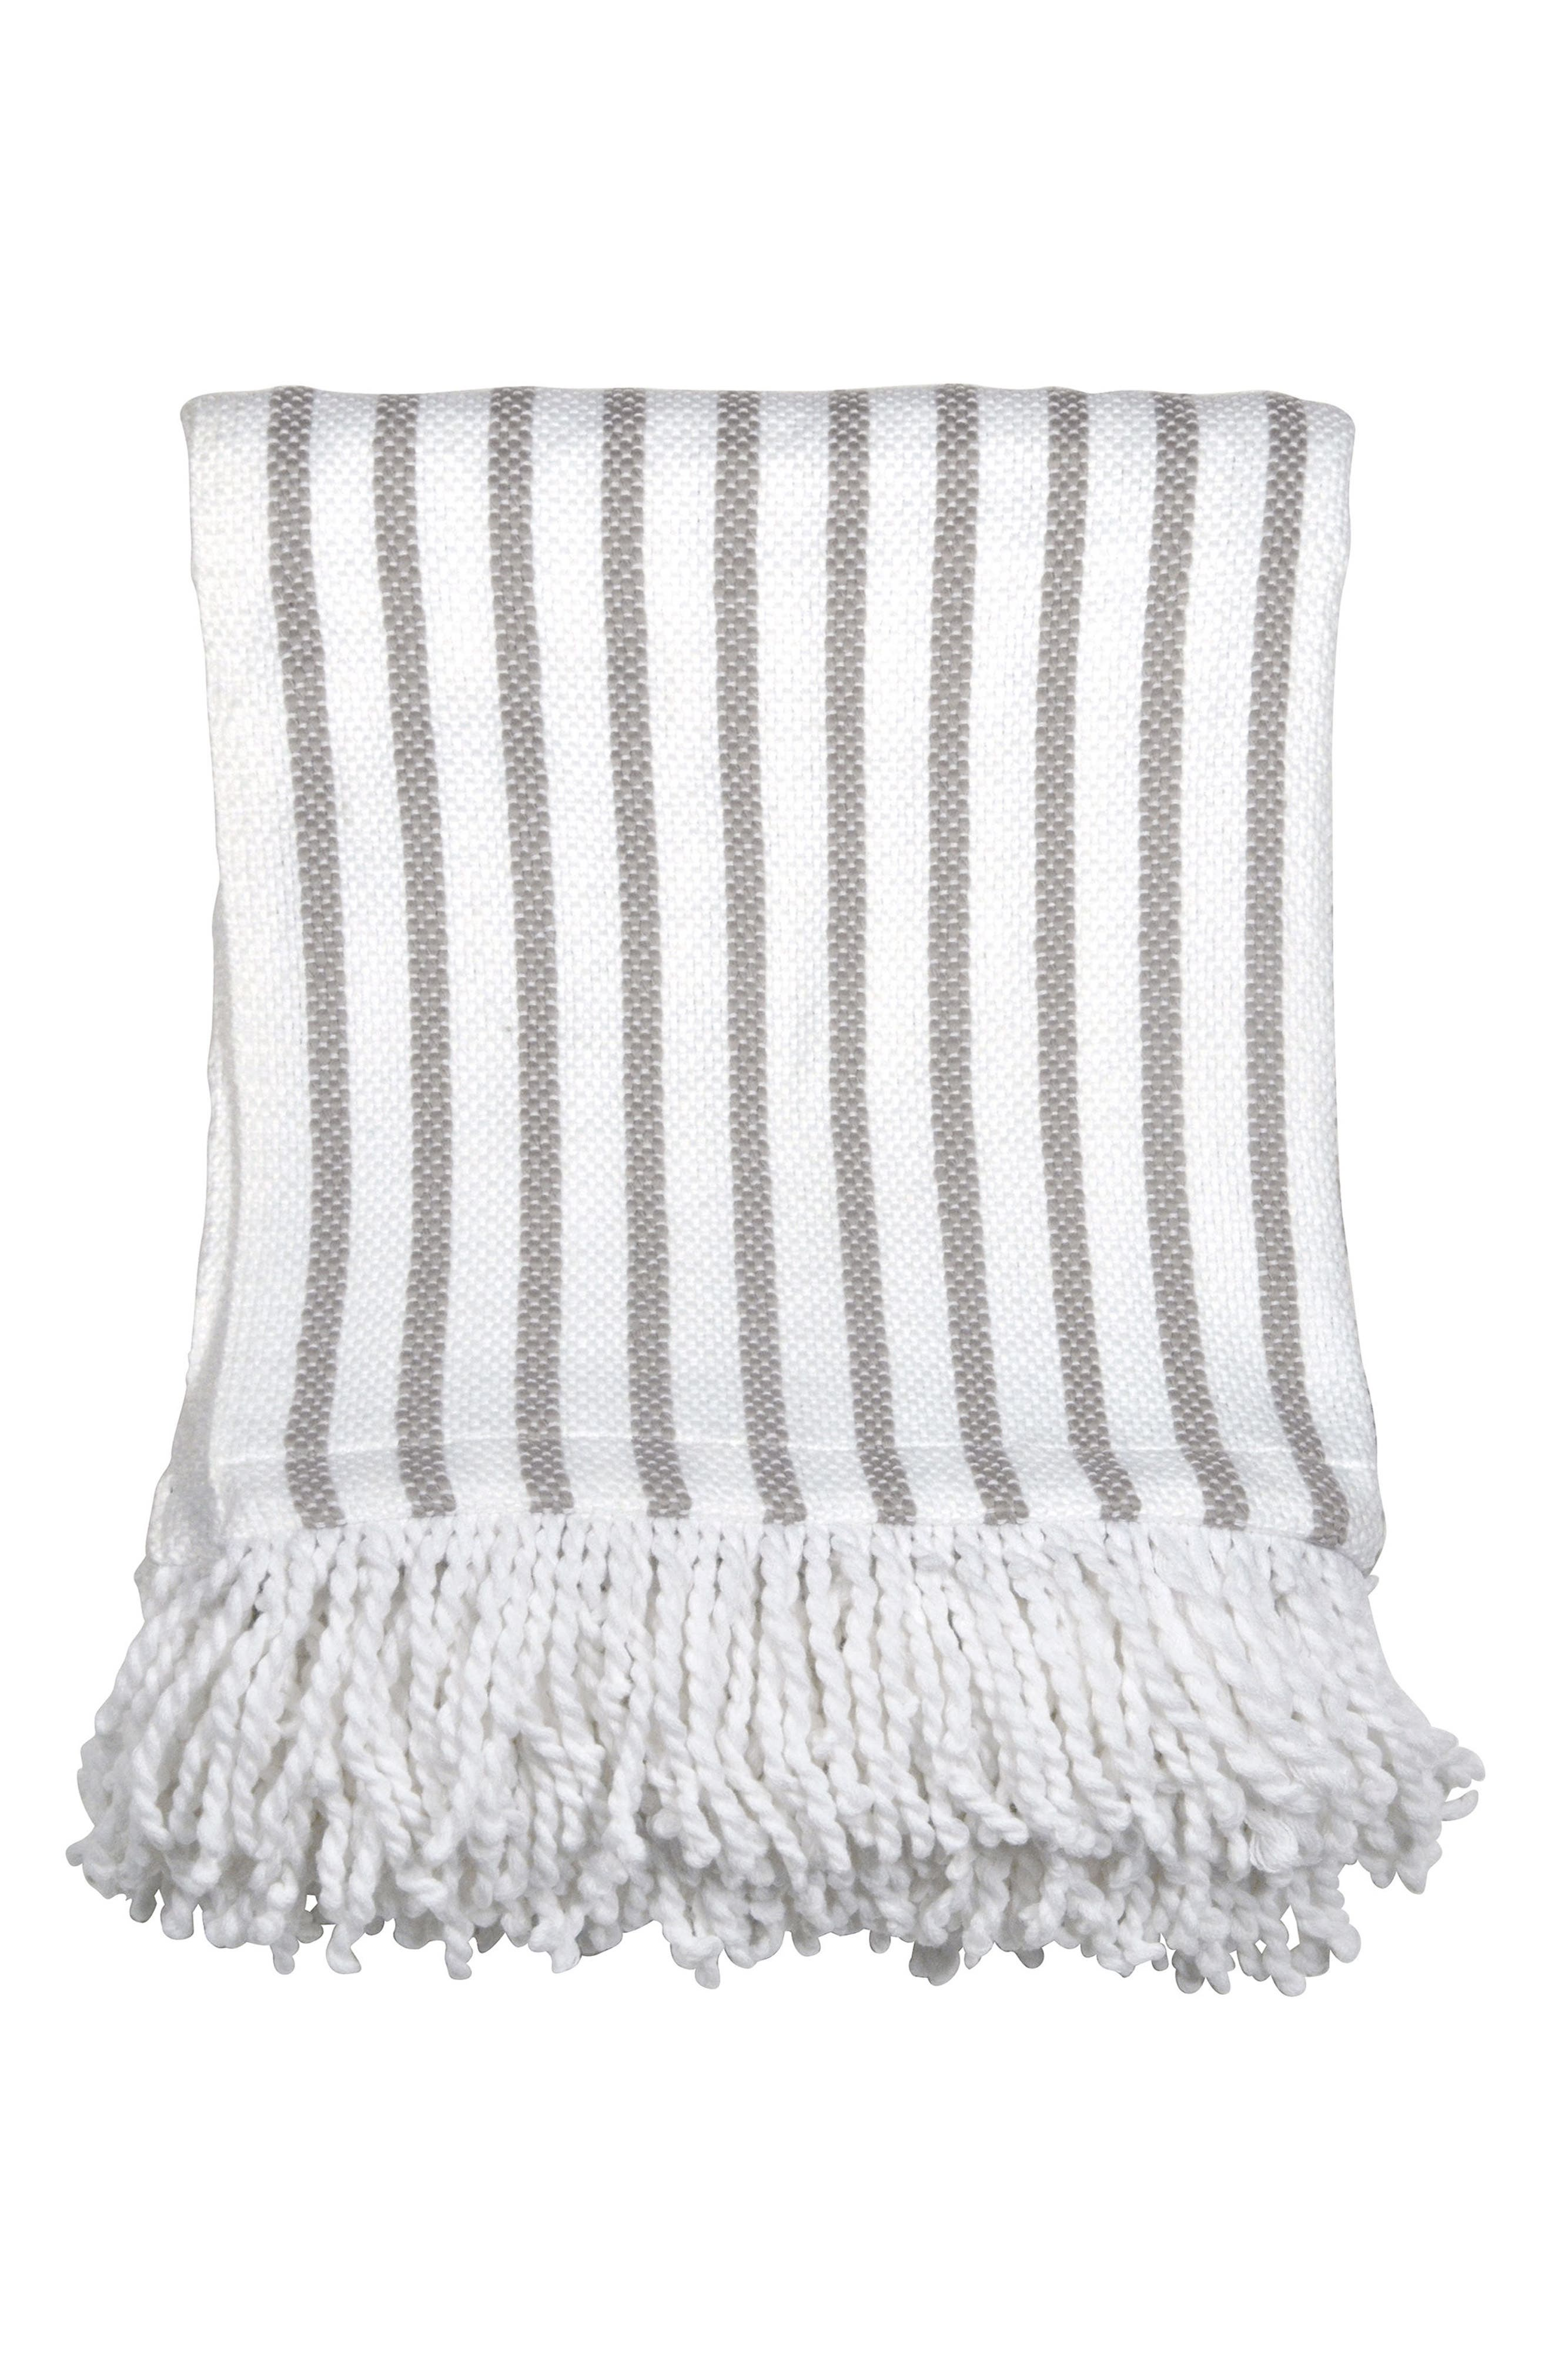 Fringe Throw Blanket,                             Main thumbnail 1, color,                             GREY/ WHITE